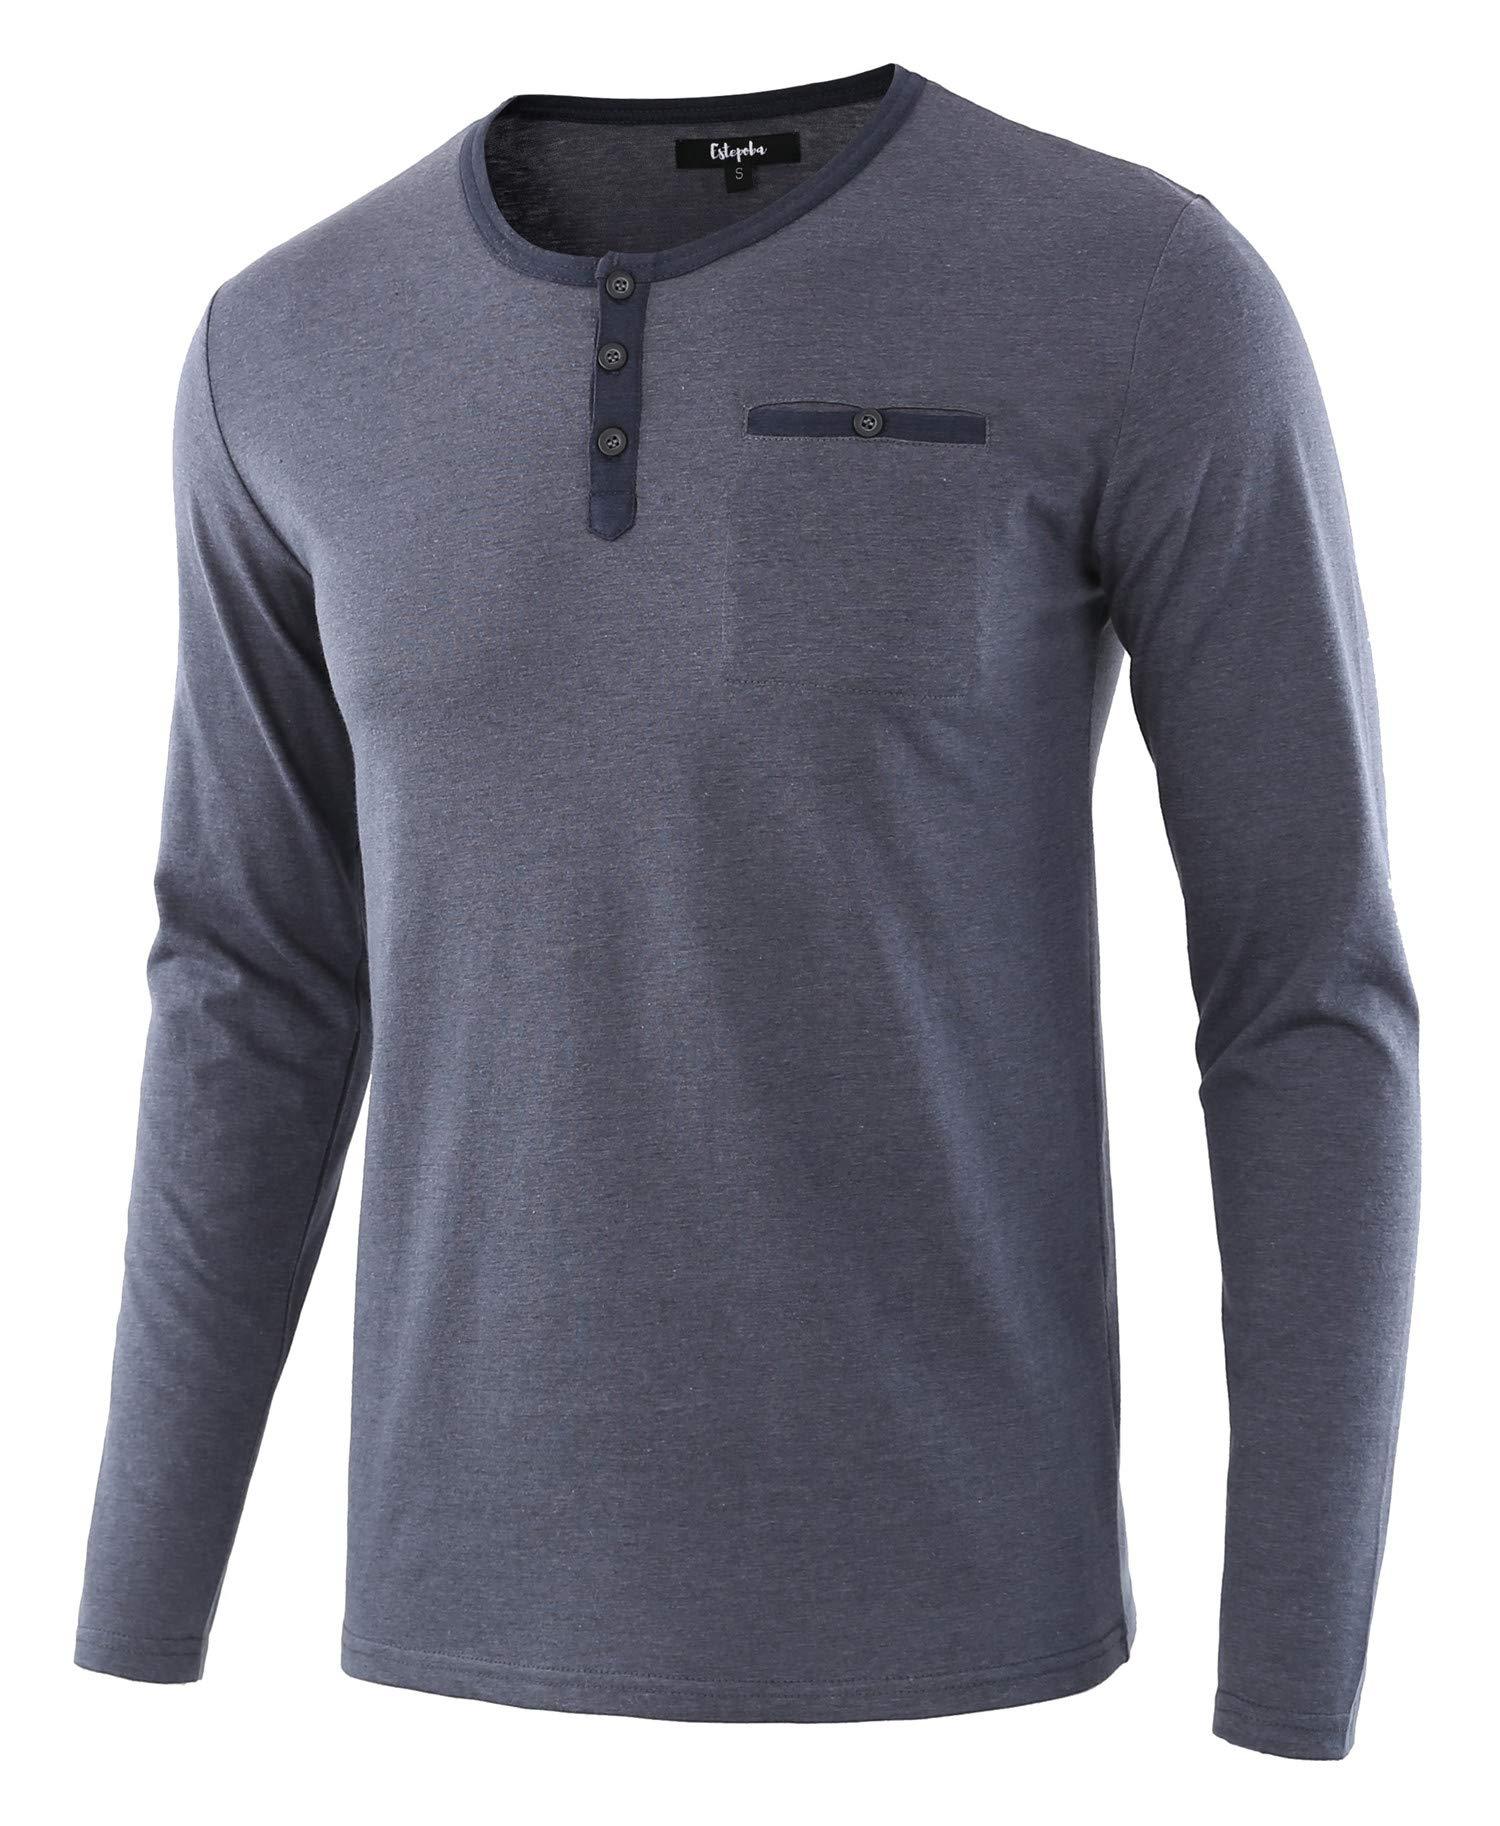 Estepoba Men's Casual Regular Fit Basic Long Sleeve Jersey Henley Pocket T-Shirt Cadet Blue/Navy XL